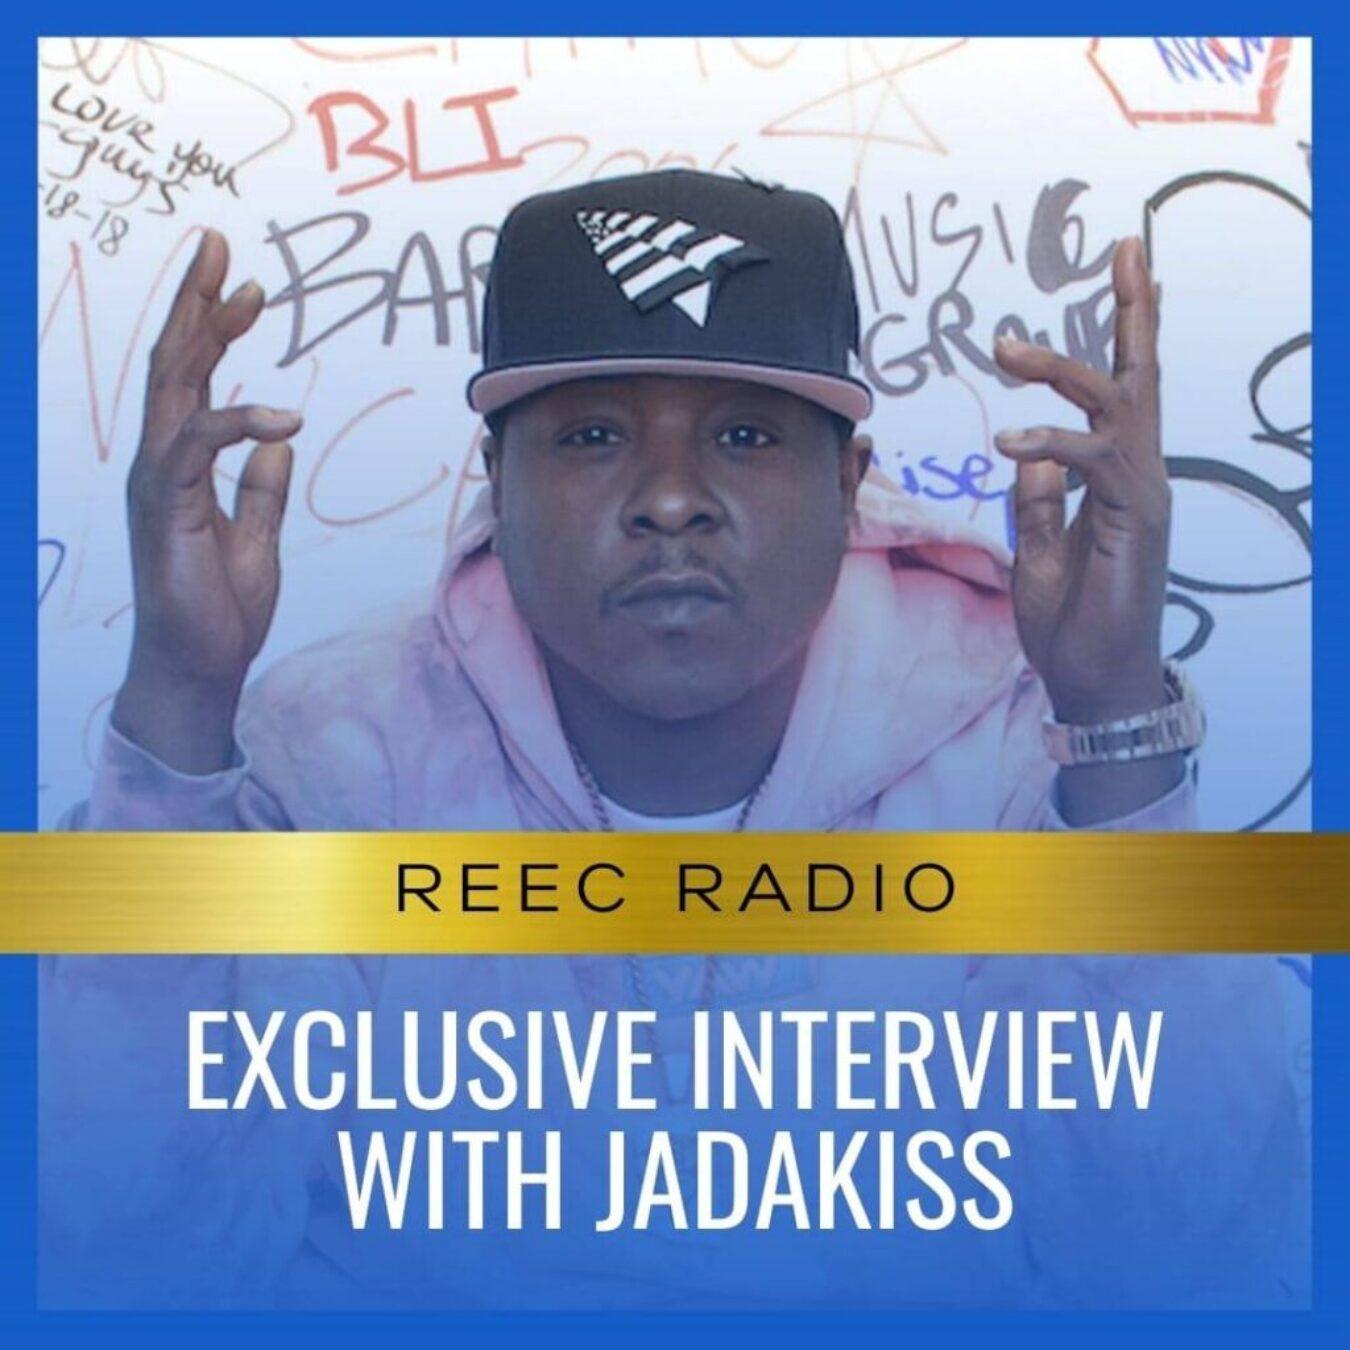 Exclusive interview with Jadakiss-2